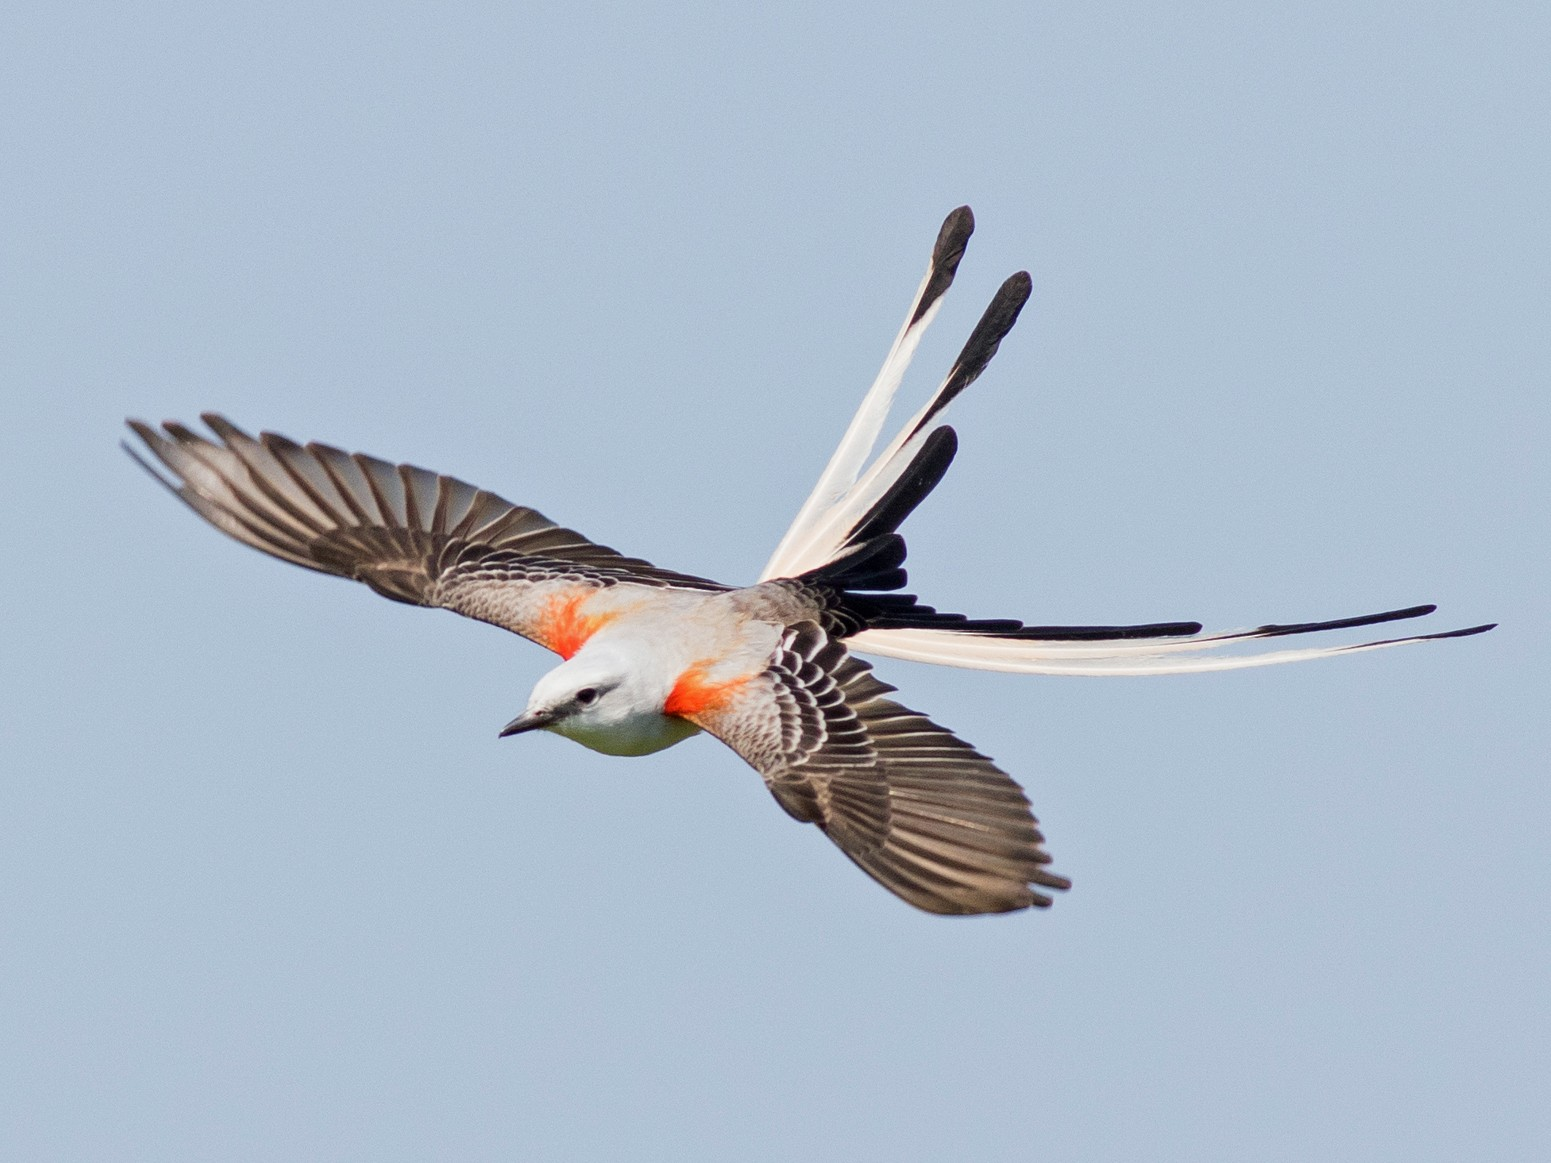 Scissor-tailed Flycatcher - Doug Gochfeld